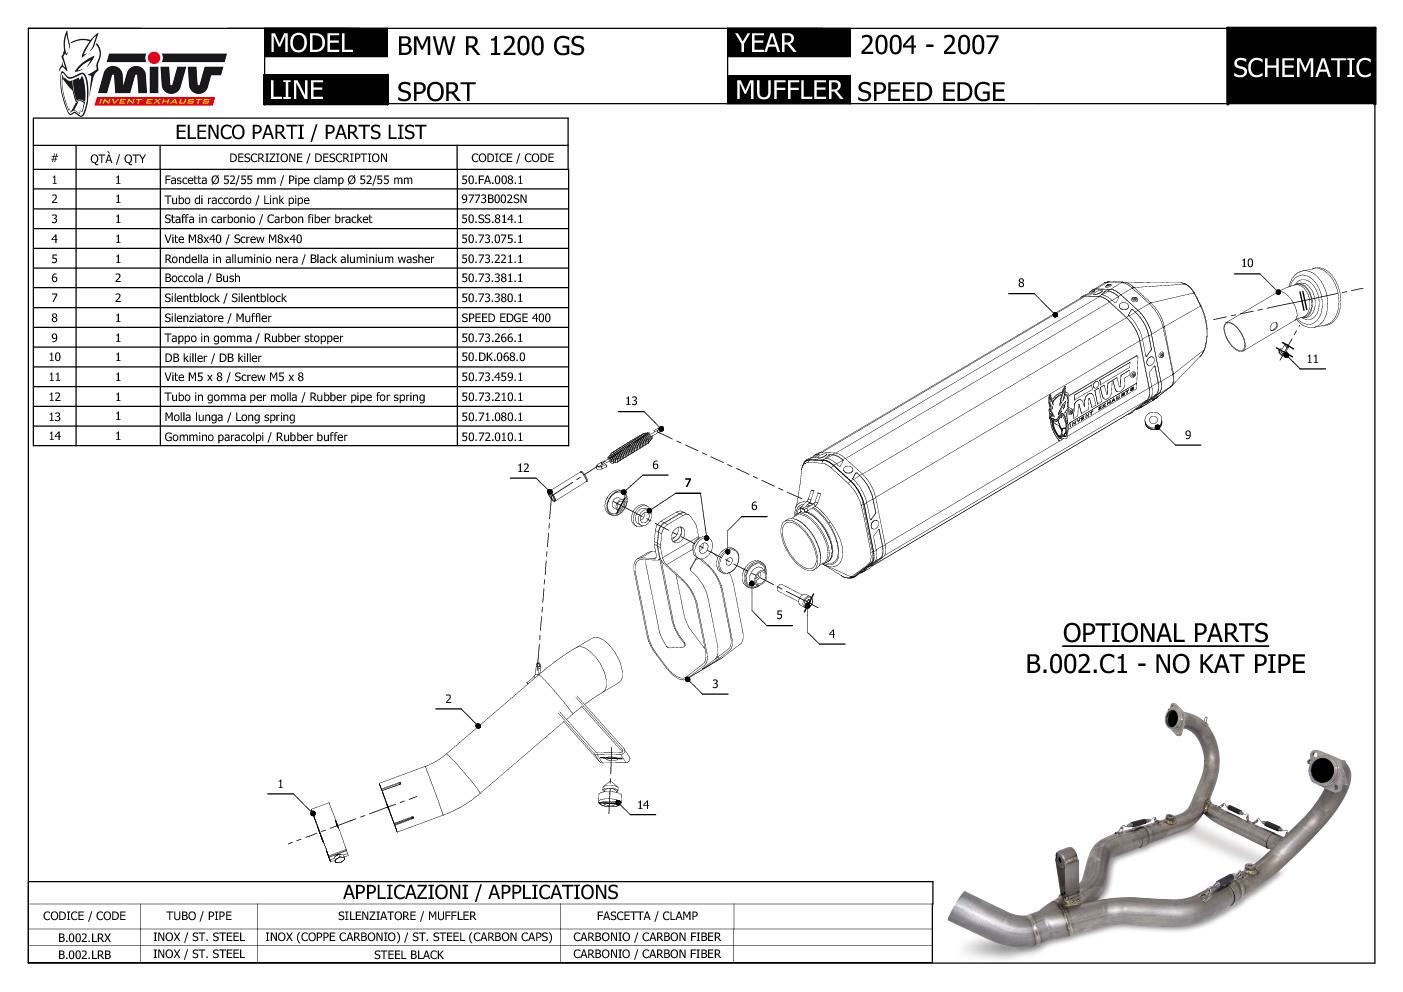 Mivv Exhaust Muffler Speed Edge Stainless Steel for Bmw R